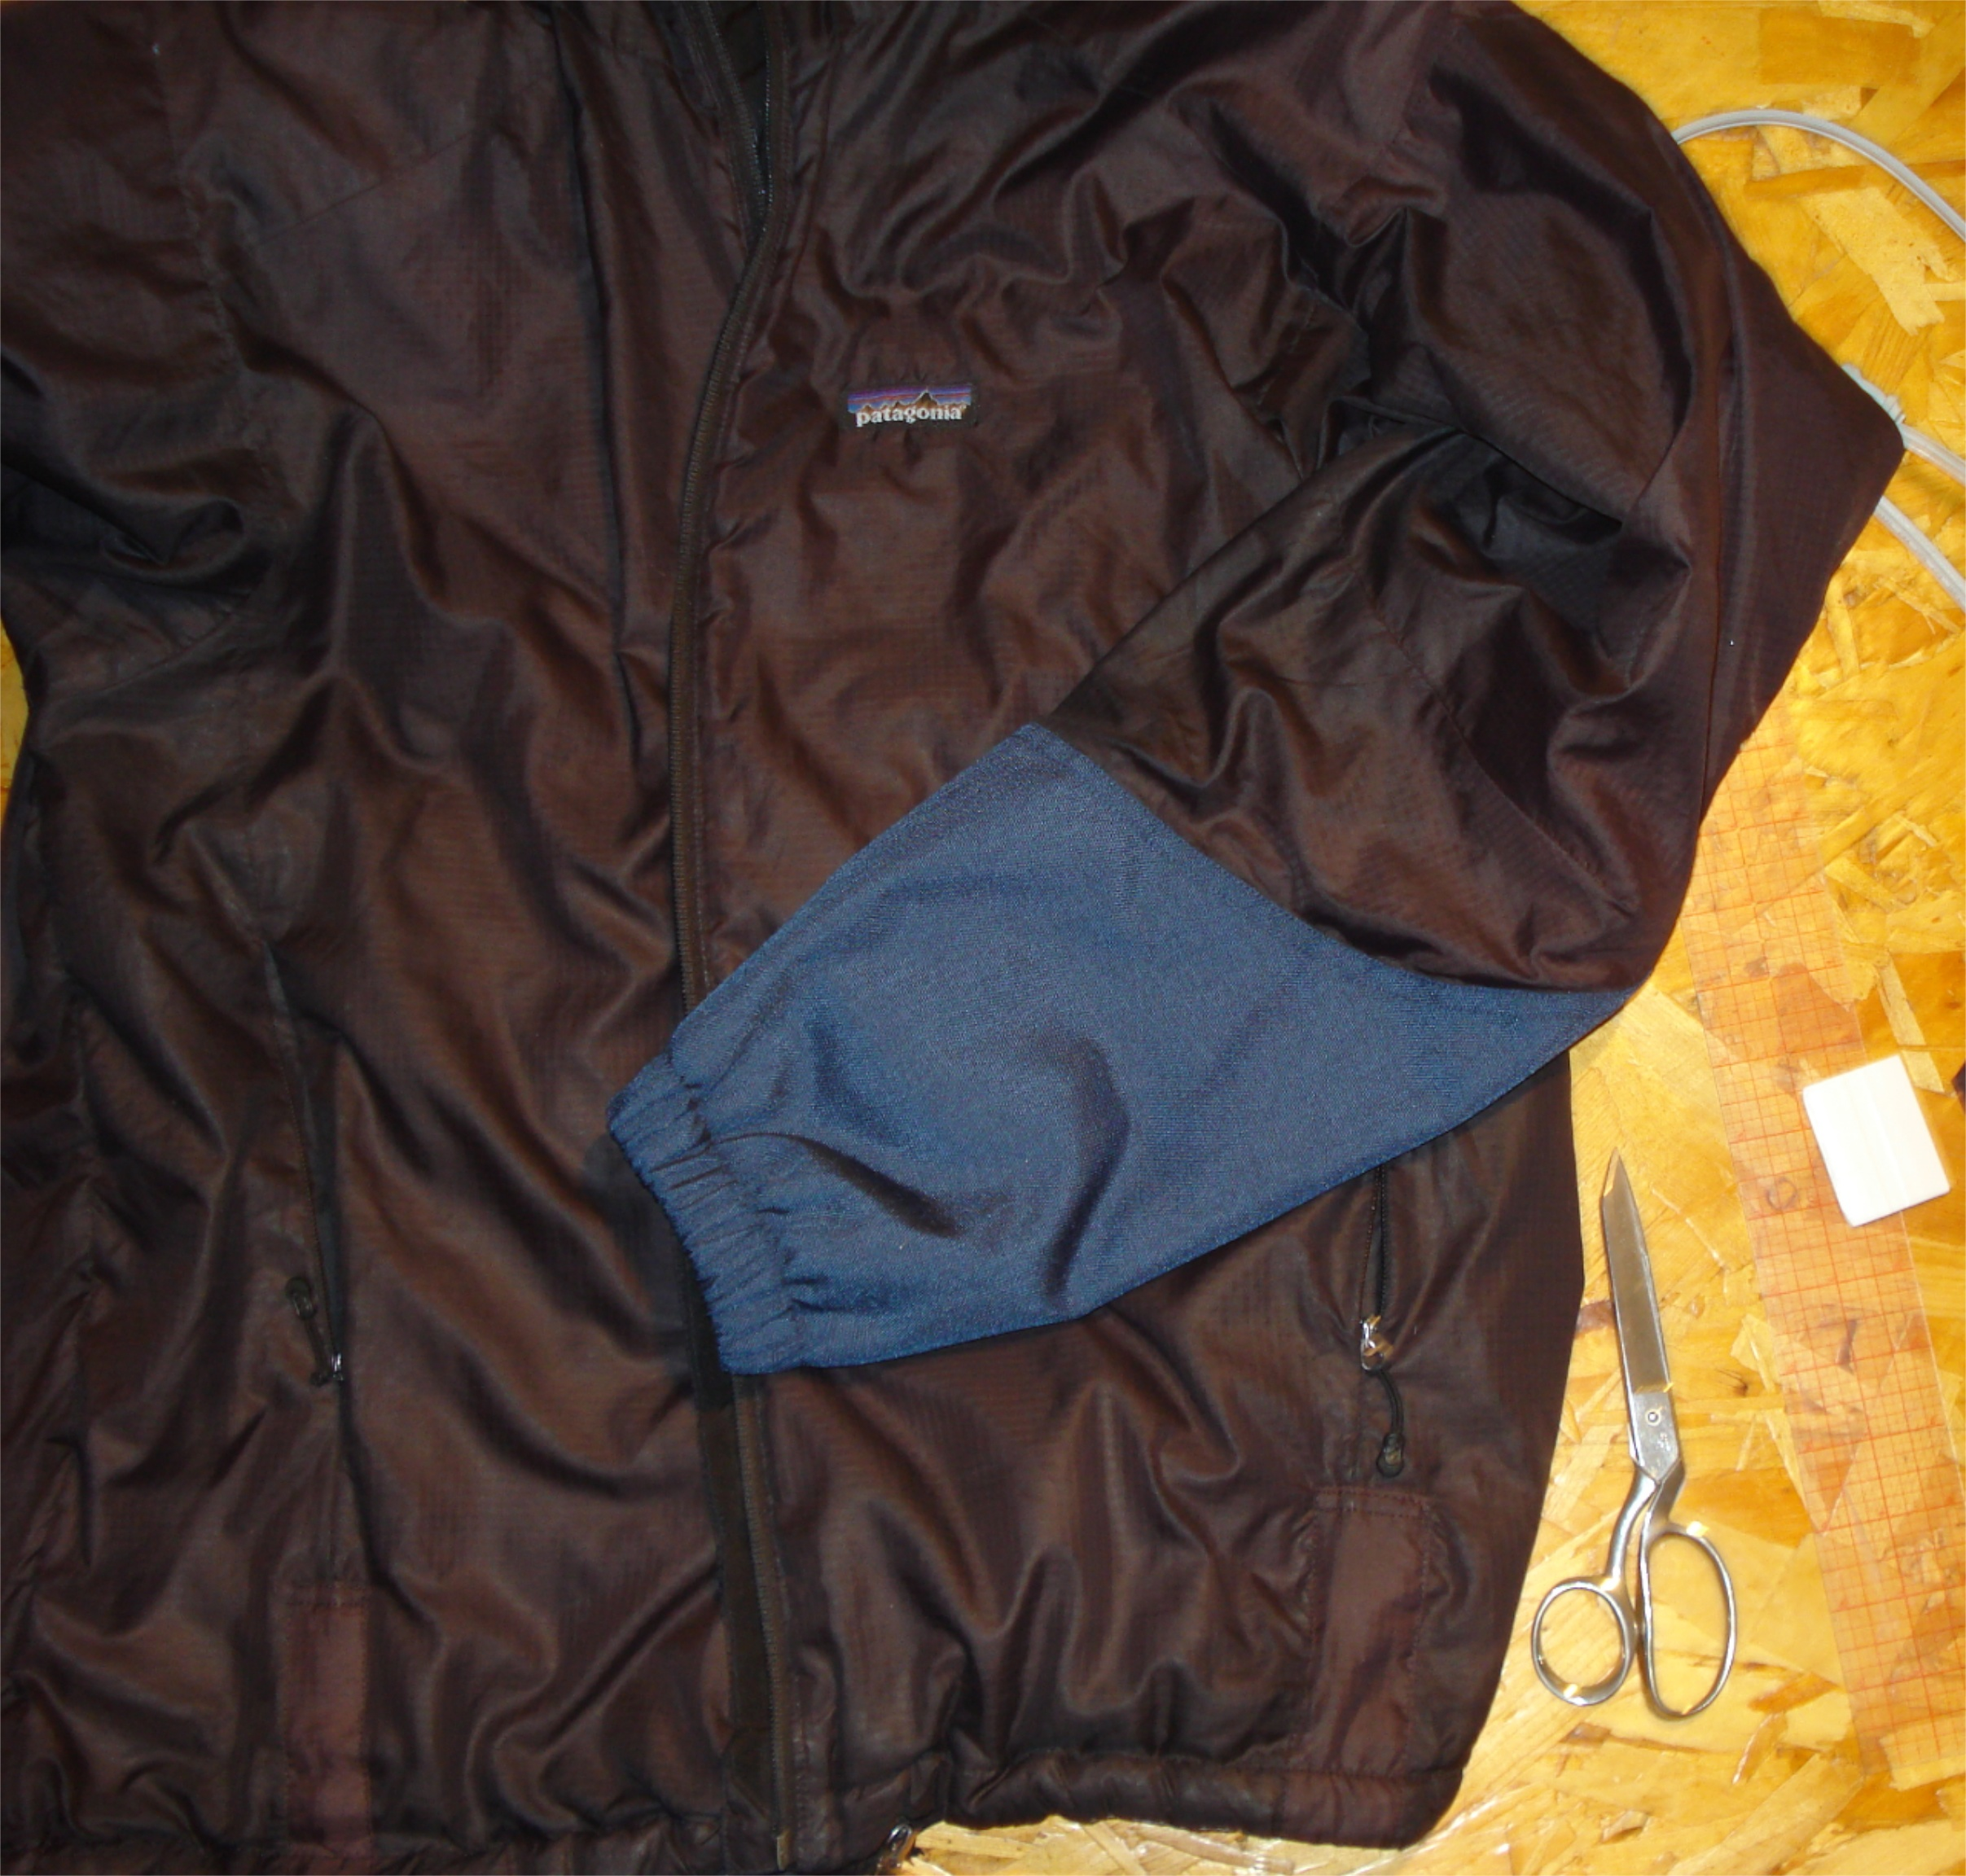 Patagonia Insulated Zip Hoodie